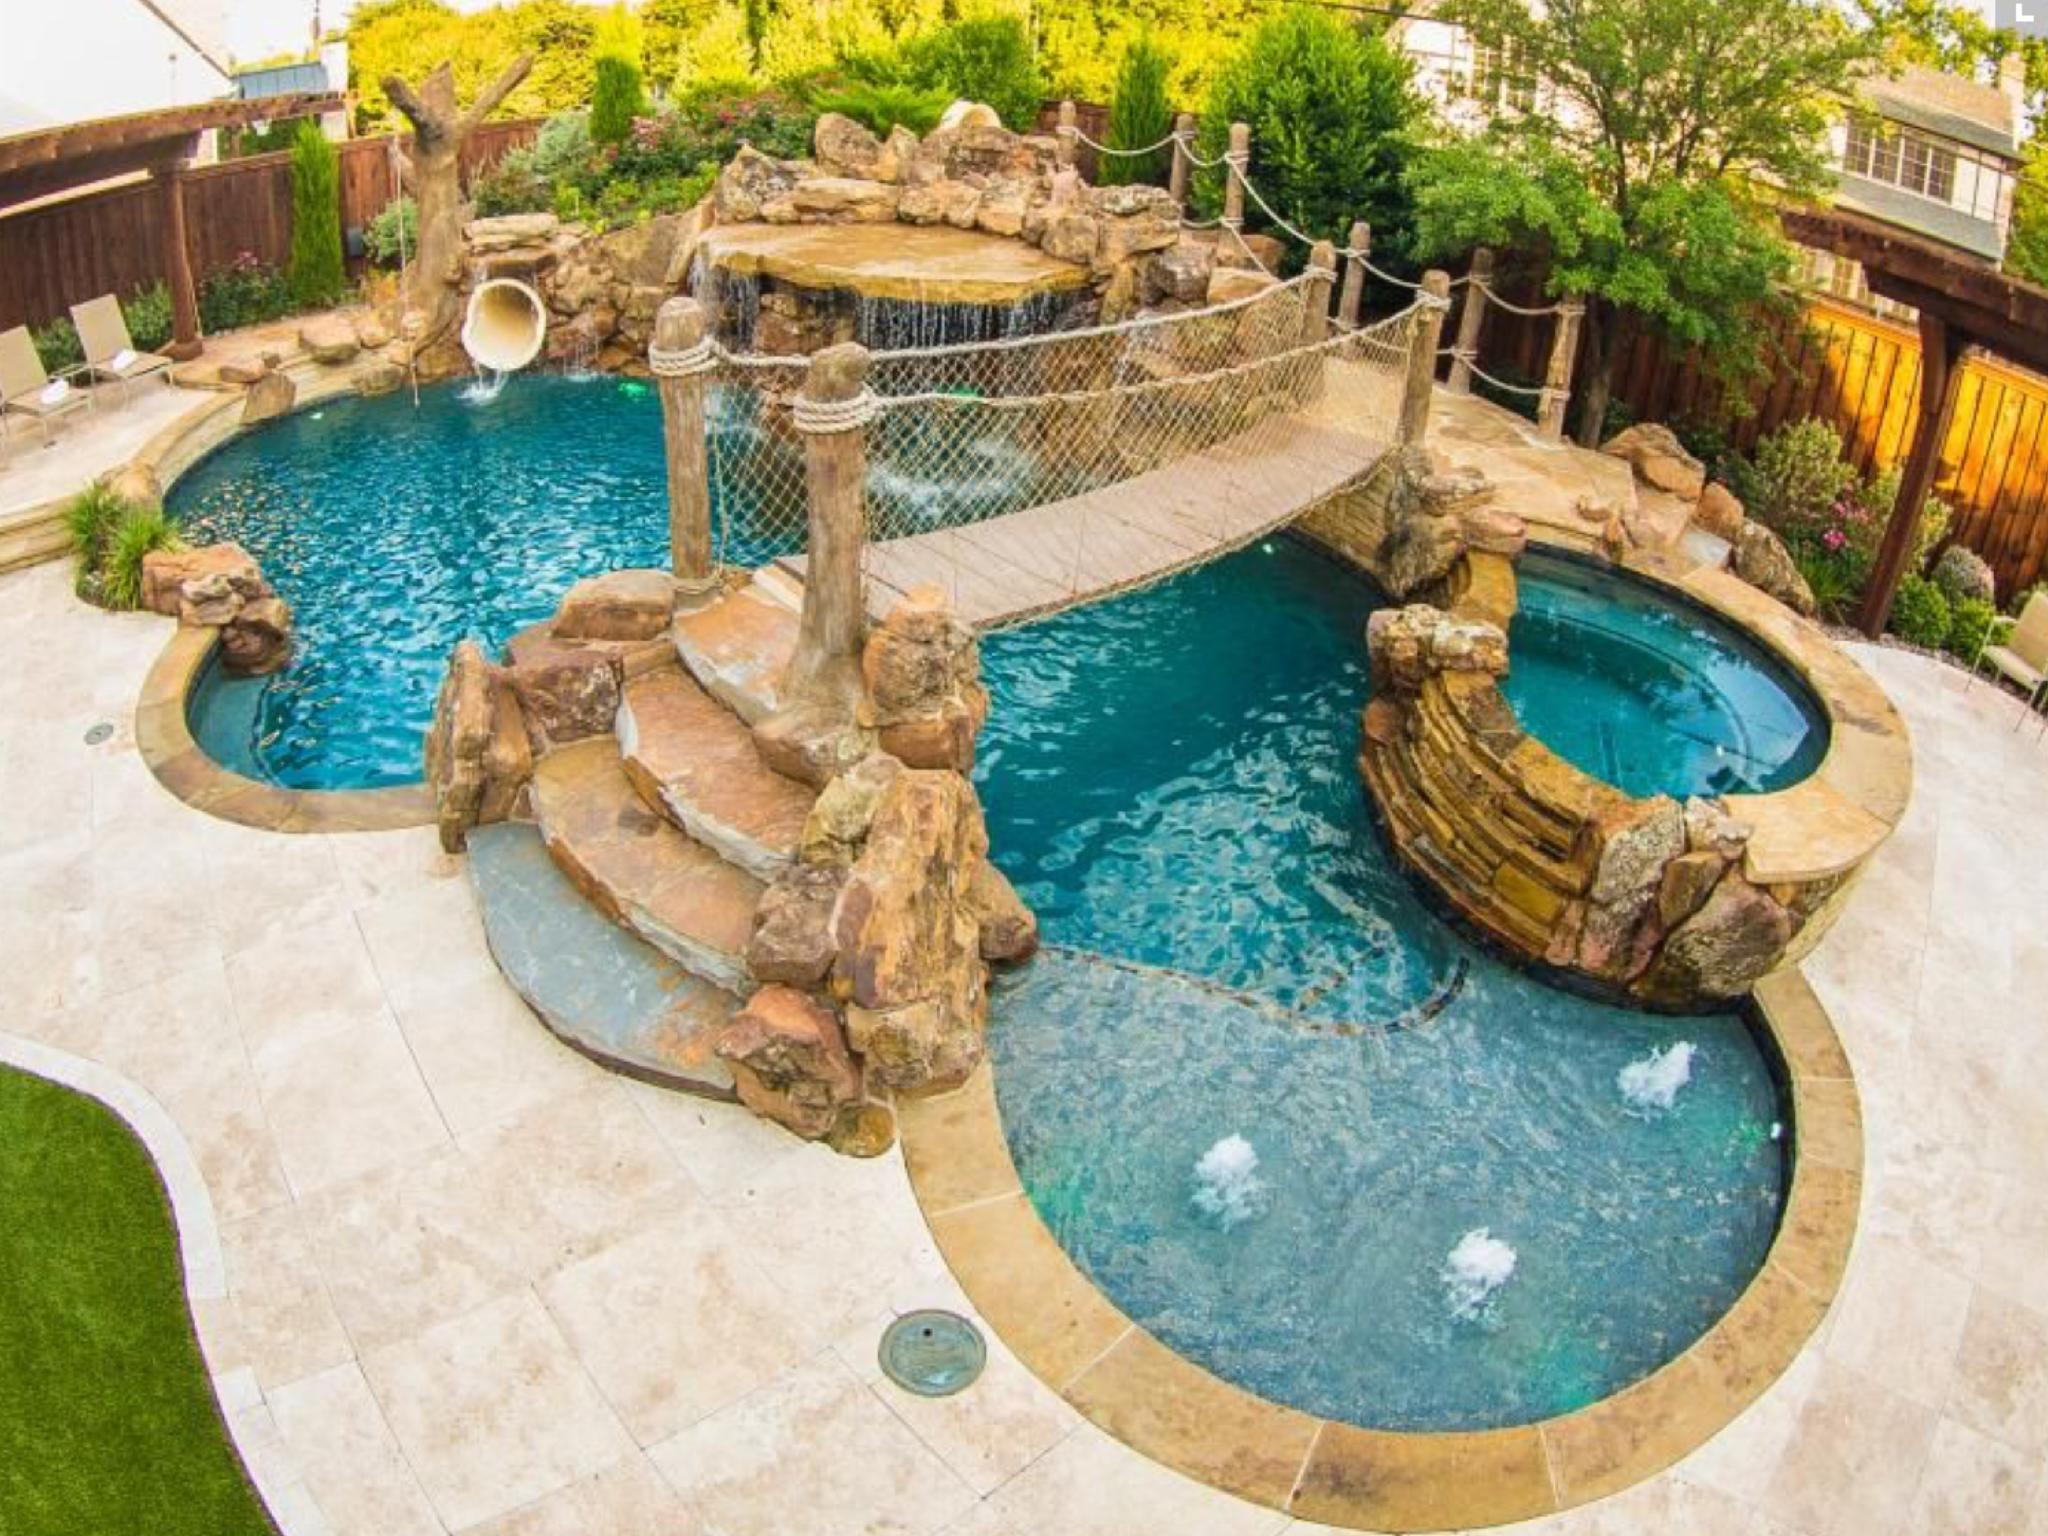 Pin By Mark Gepner On Shop Home Dream Pools Backyard Pool Designs Backyard Pool